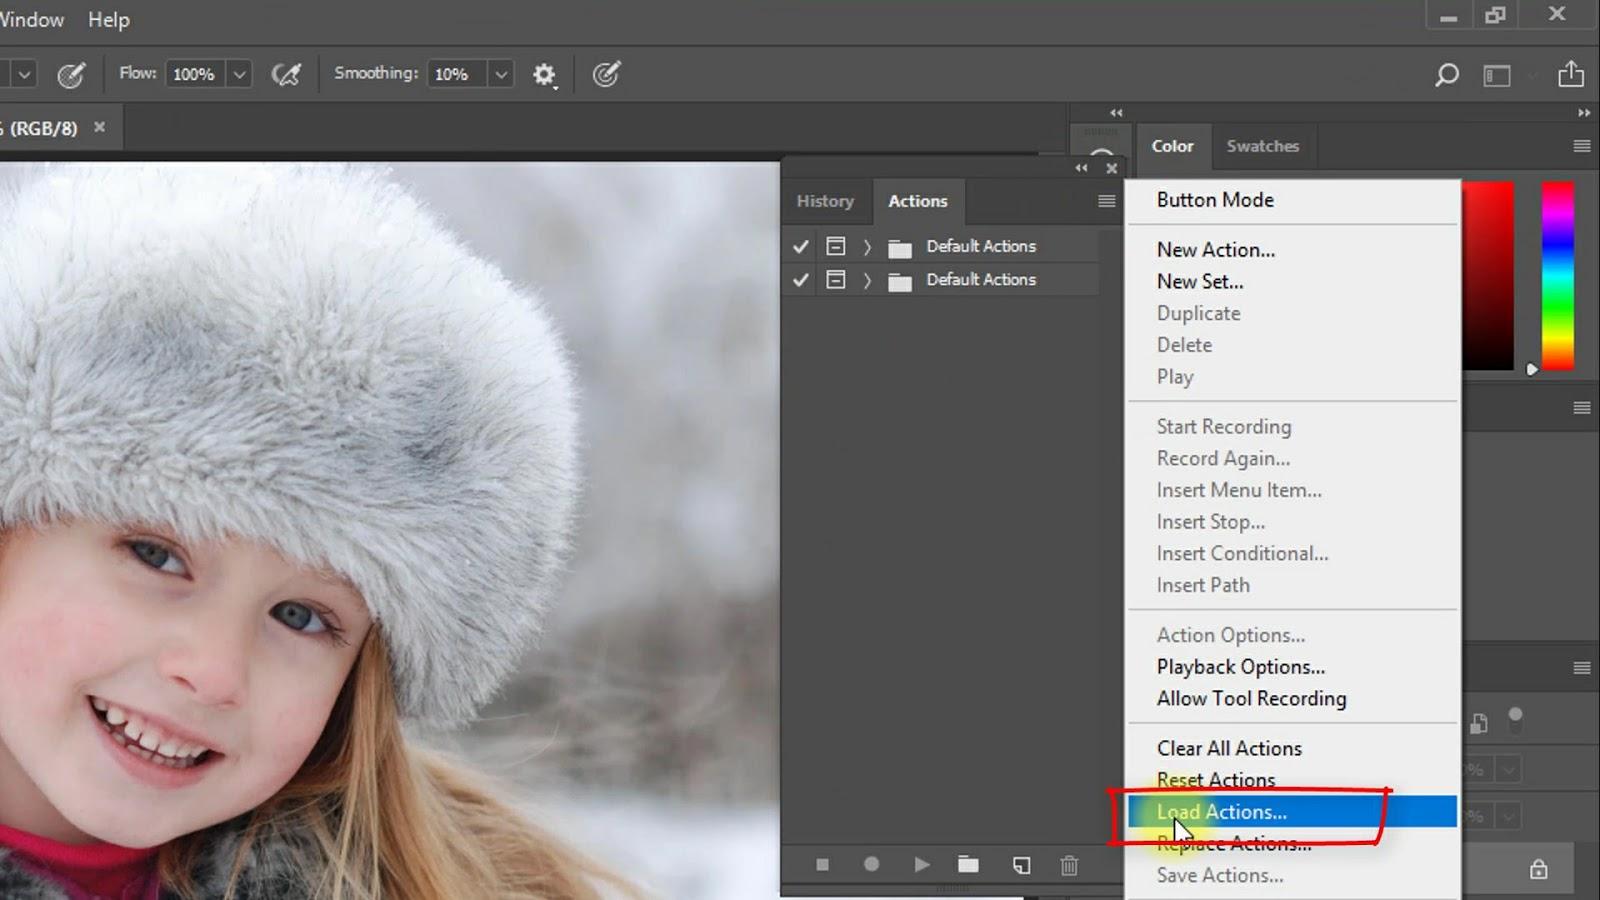 1-Click Automatic Realistic SNOW EFFECT Screenshot 5